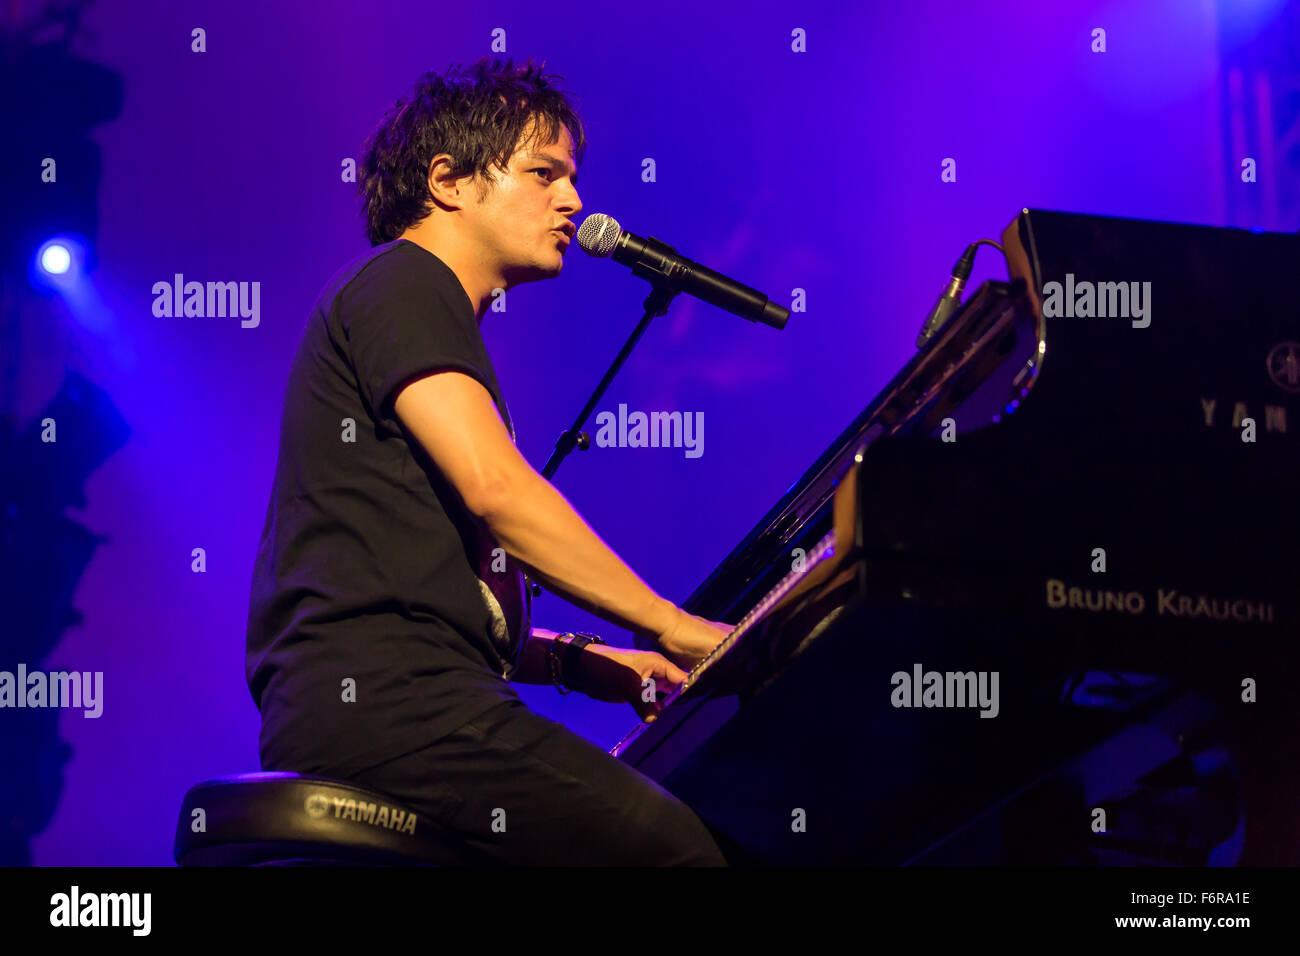 British singer and songwriter Jamie Cullum live at the Blue Balls Festival, Lucerne, Switzerland - Stock Image